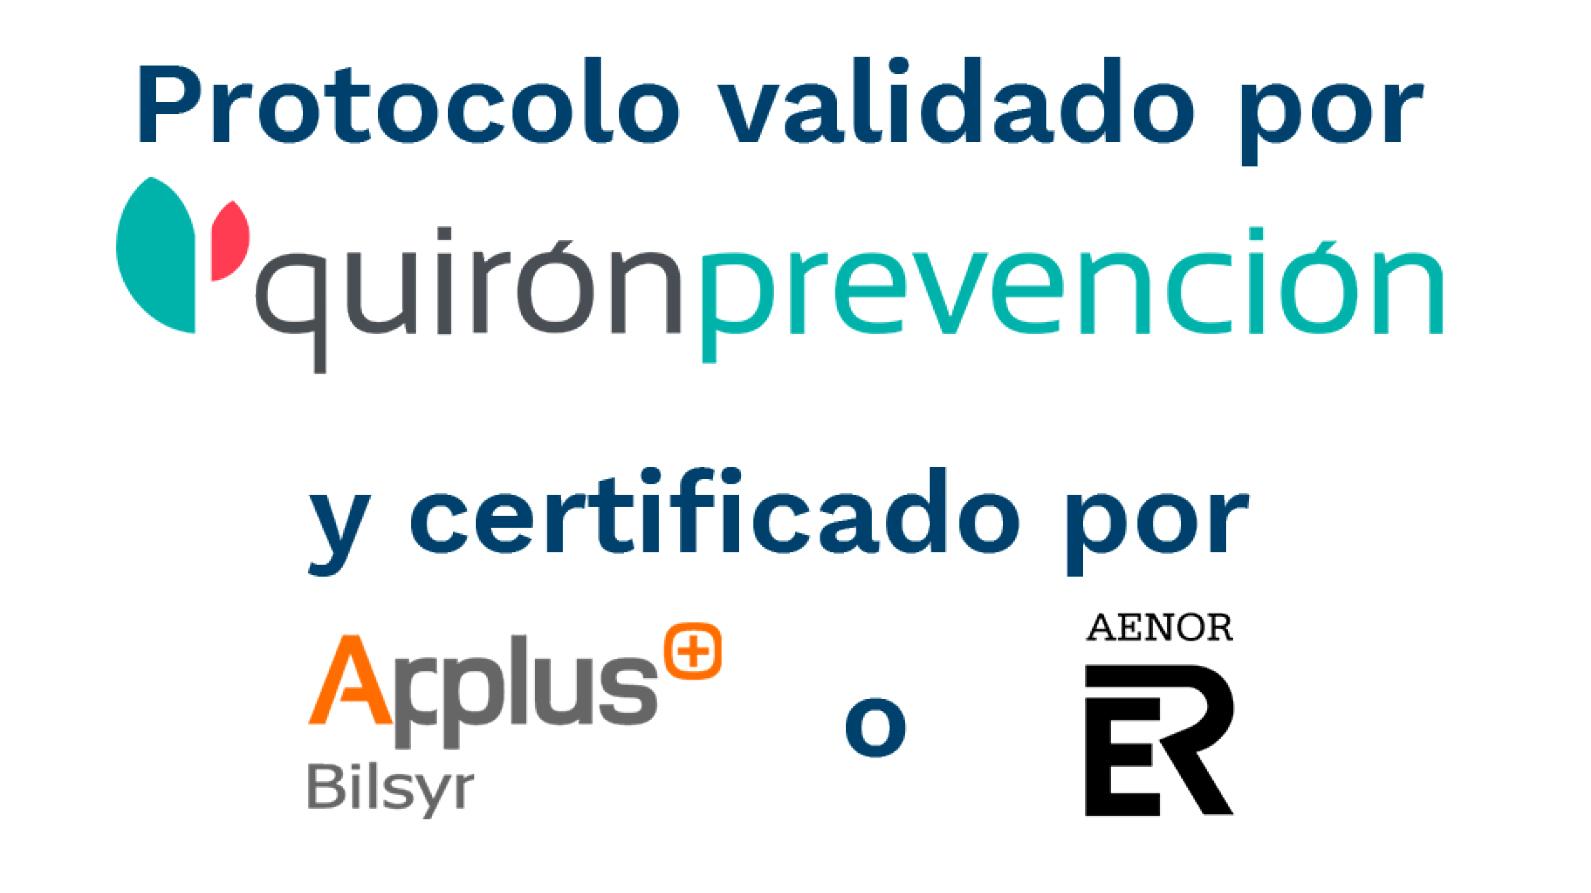 http://www.aibeconsultores.com/wp-content/uploads/2020/06/certificacion.jpg